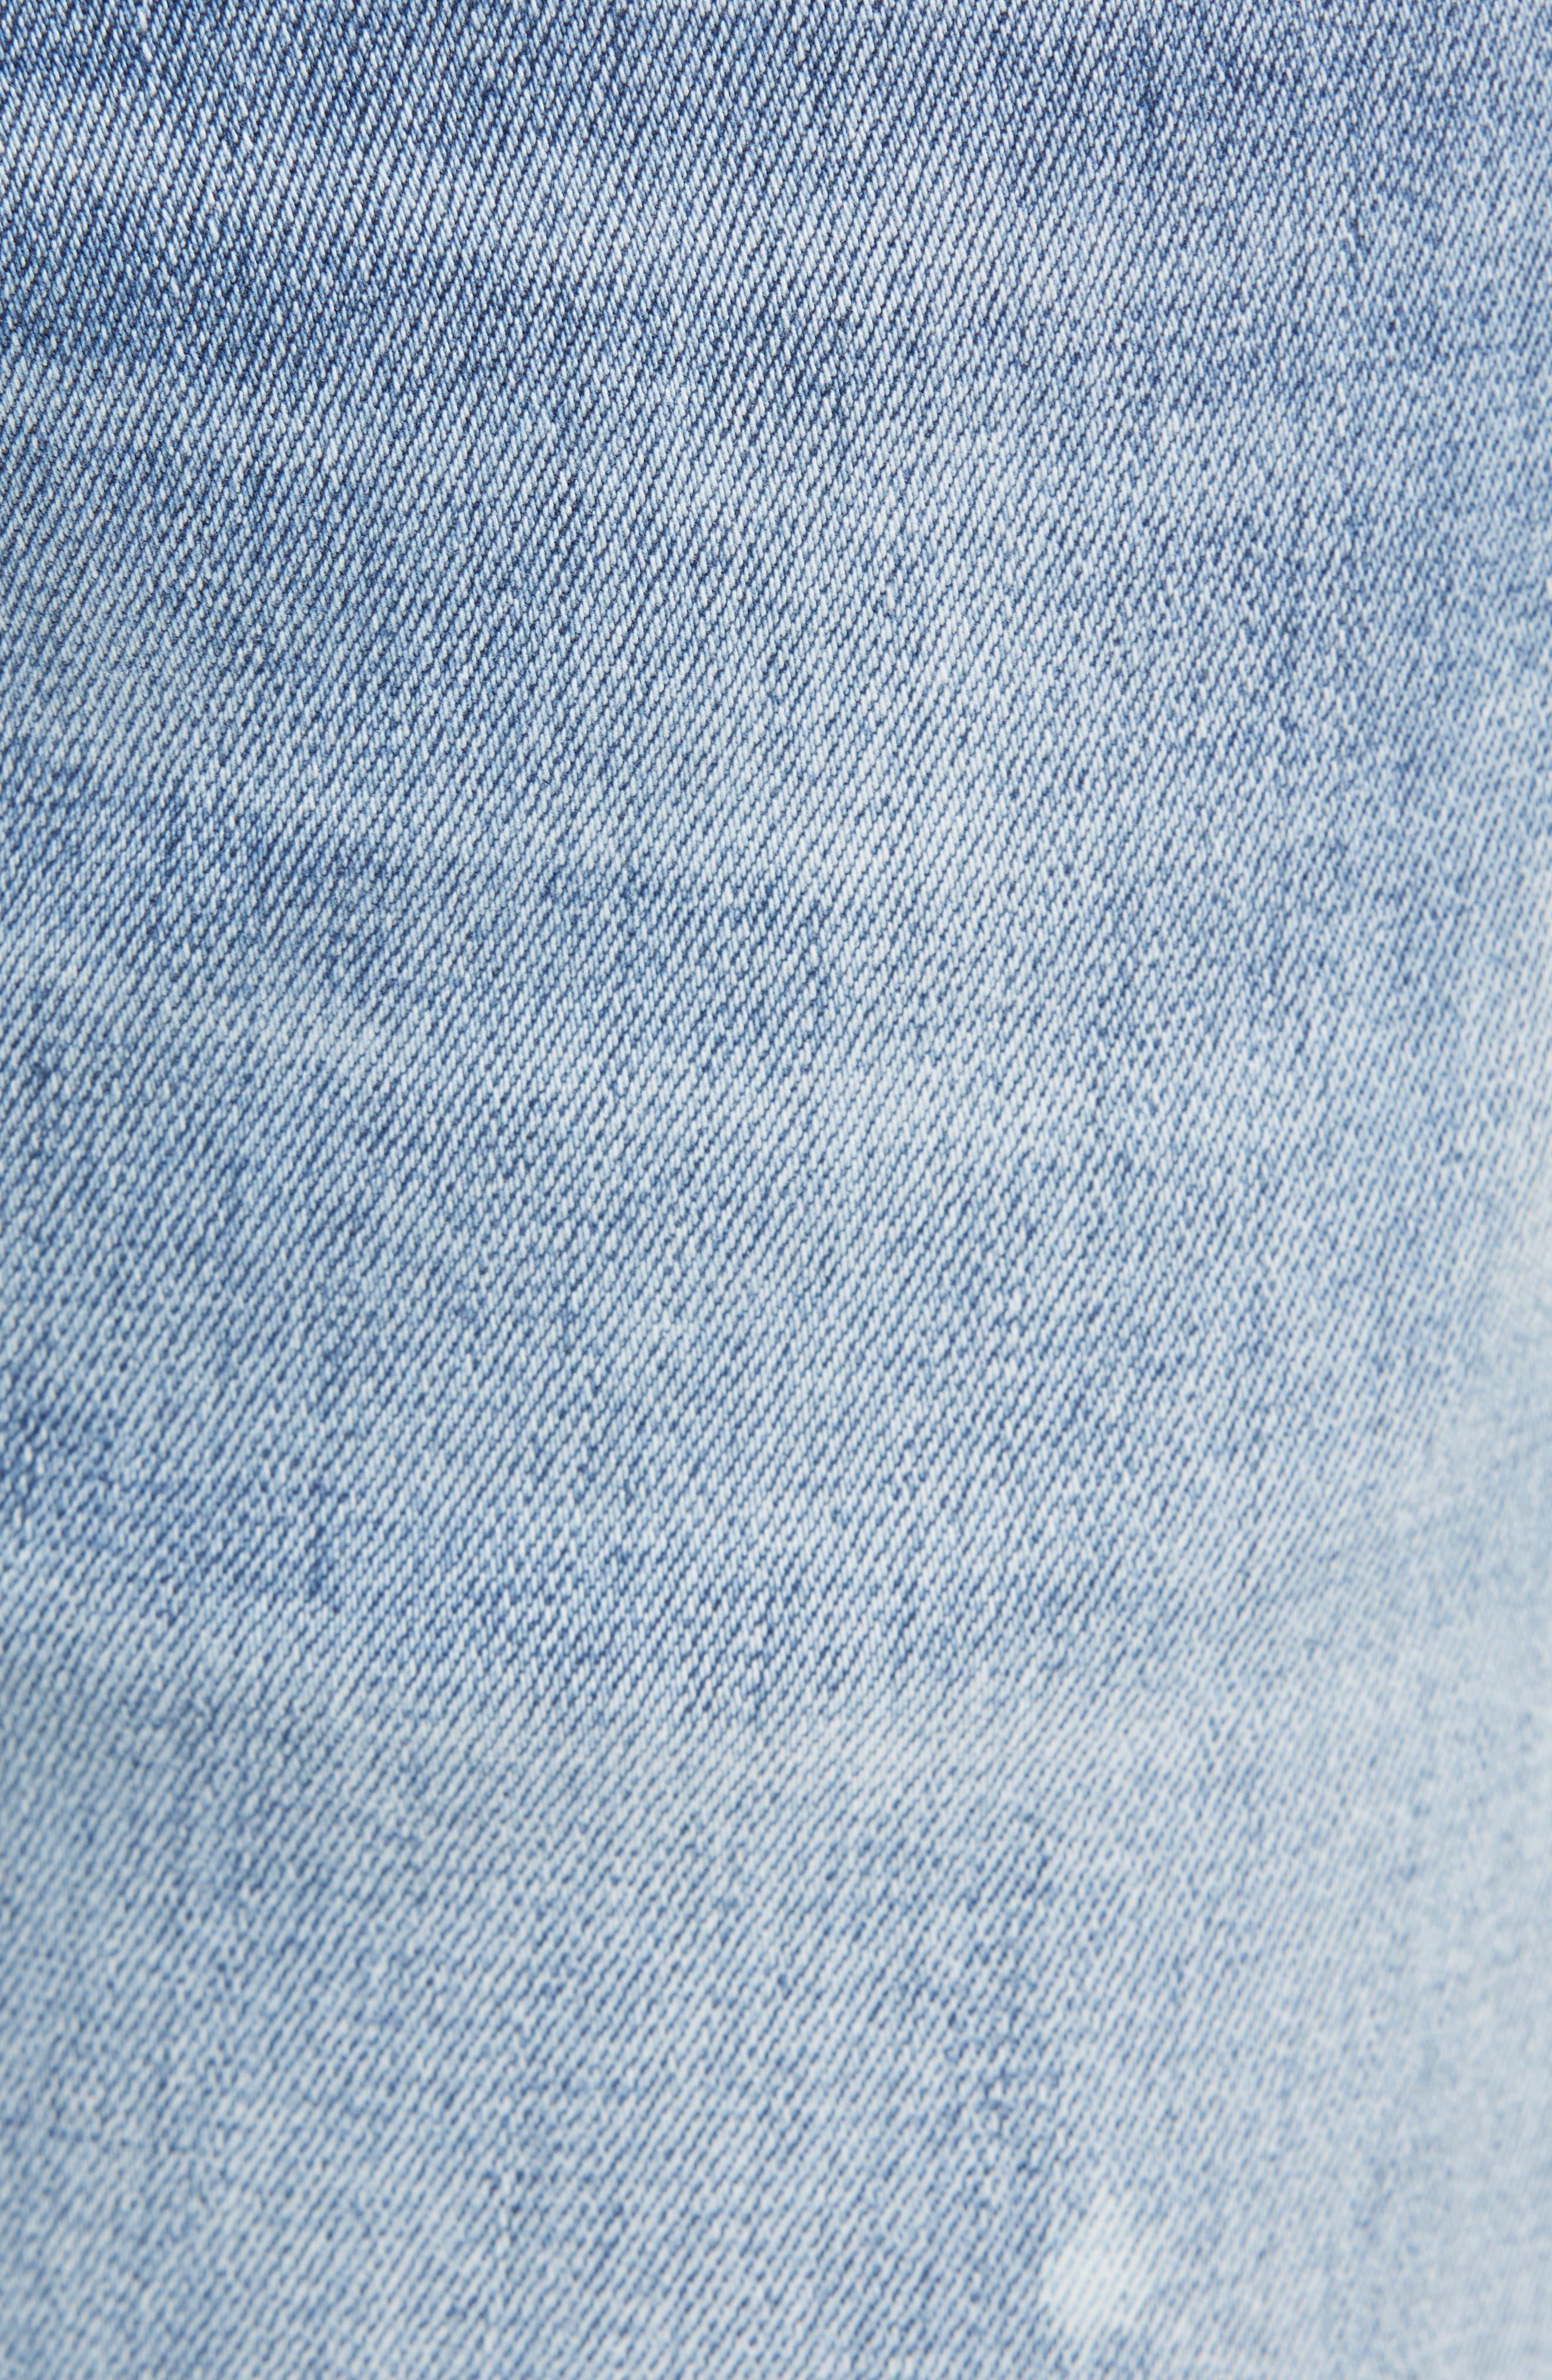 Destroyer Ripped Slim Fit Jeans,                             Alternate thumbnail 5, color,                             BLUE